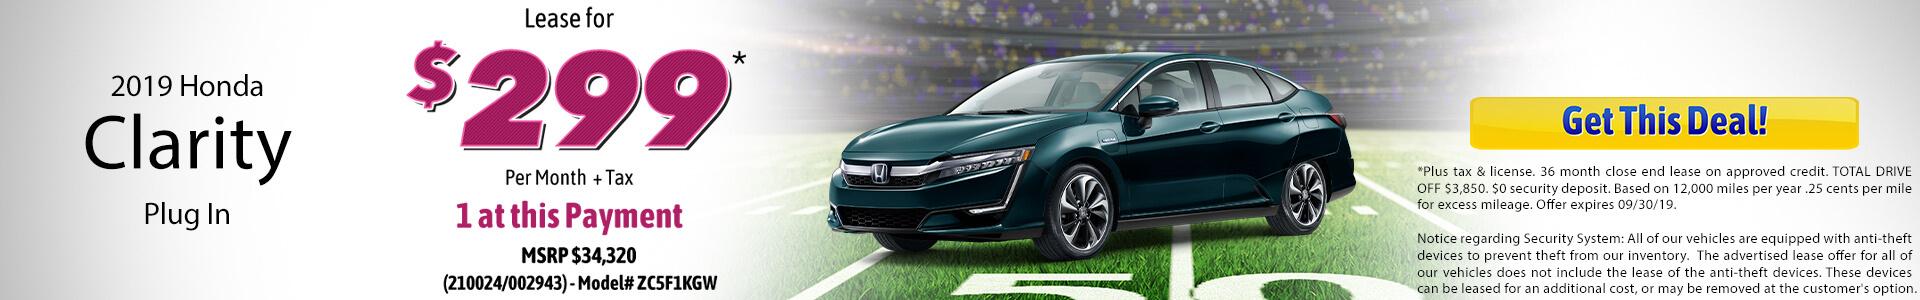 11 New Honda Civic Hatchback in stock near Pasadena, Arcadia